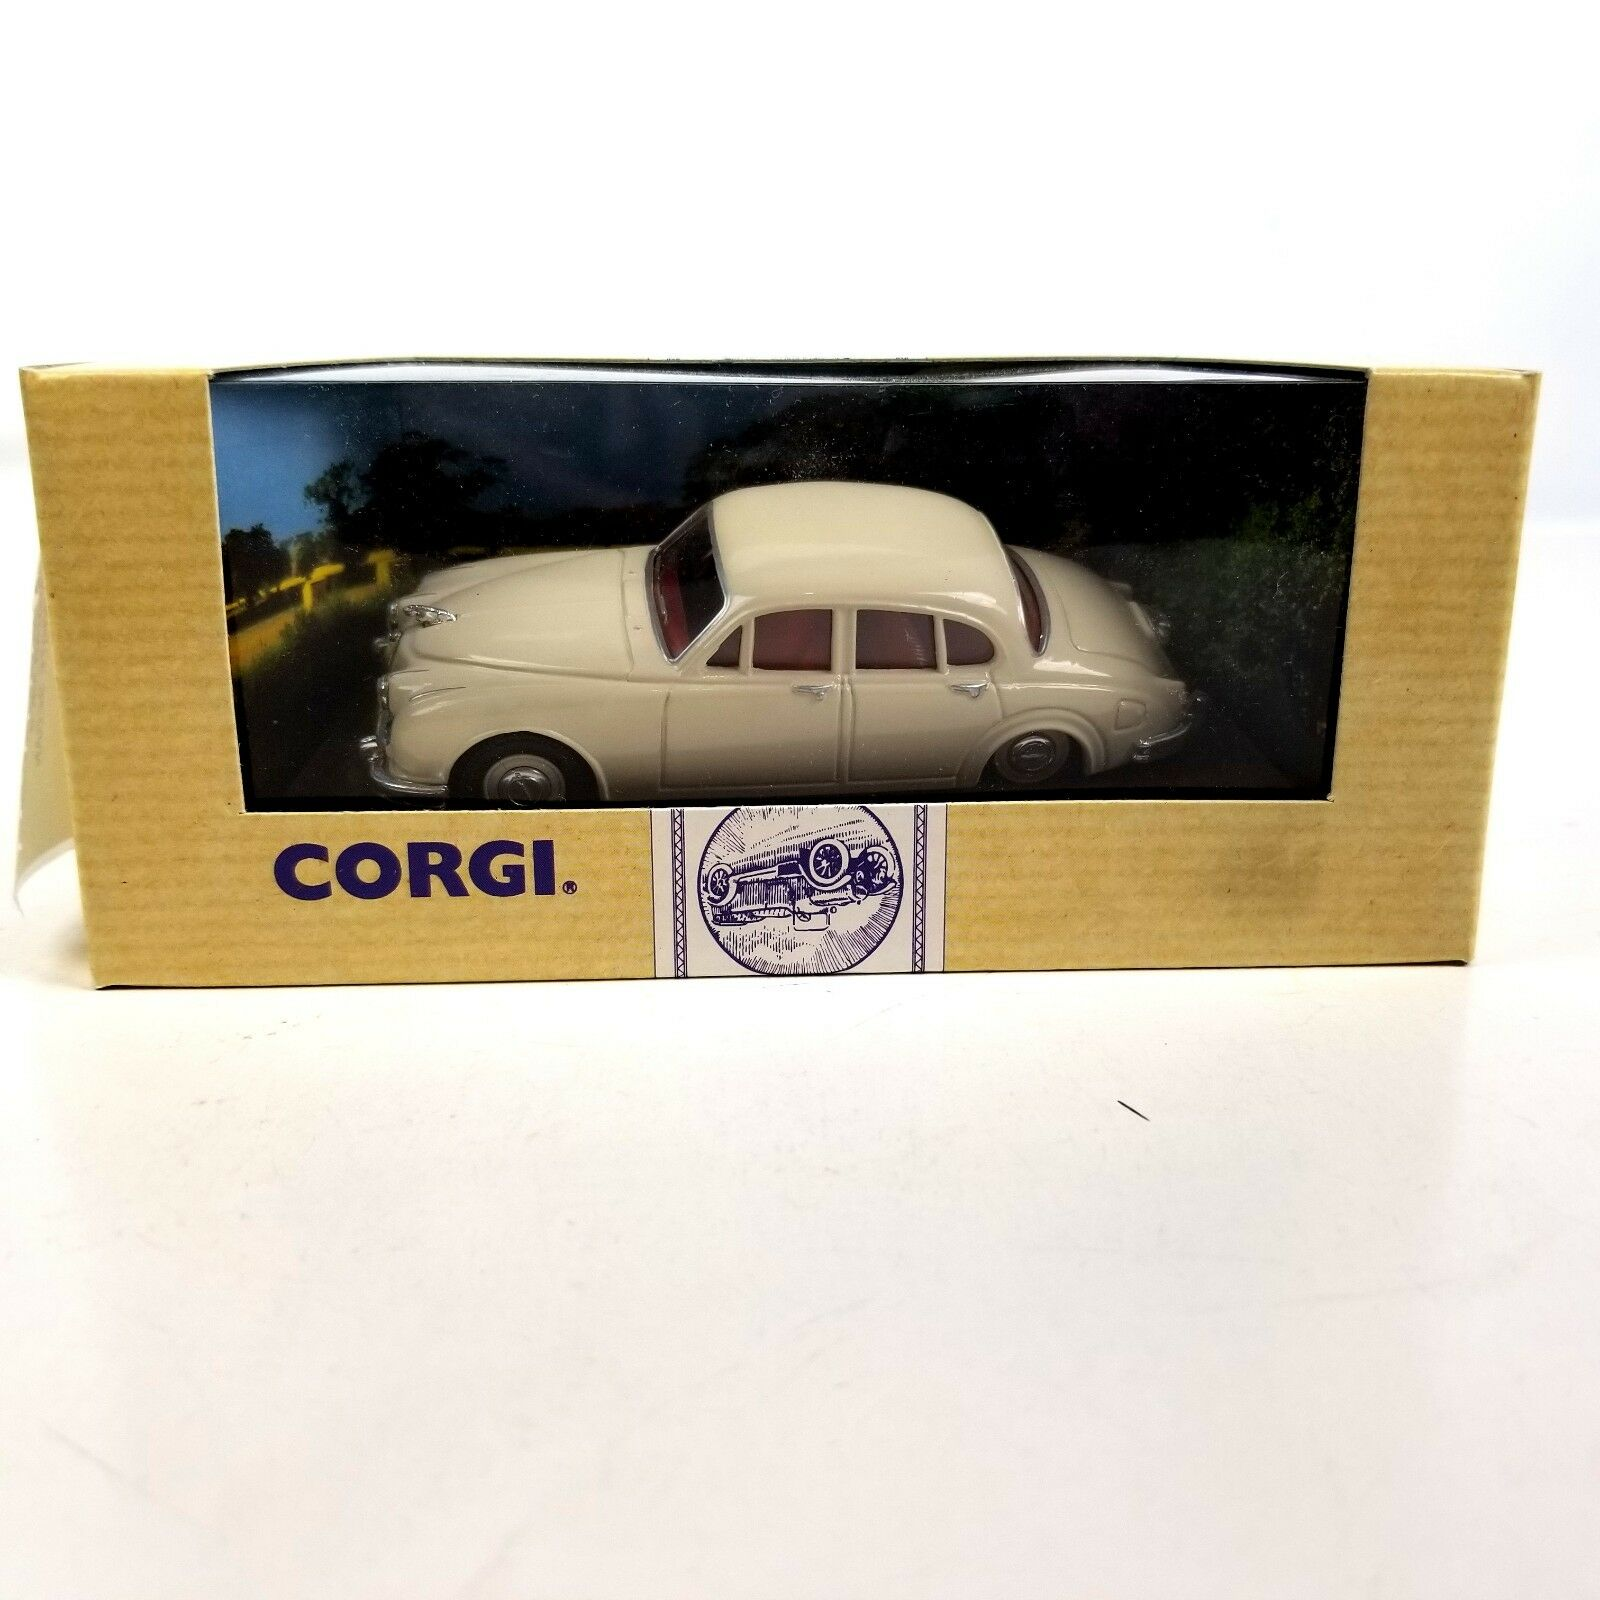 Corgi  96863 Jaguar MKII MKII MKII Sedan blancoo 1 43 o escala Diecast Modelo Coche Réplica 6b956e